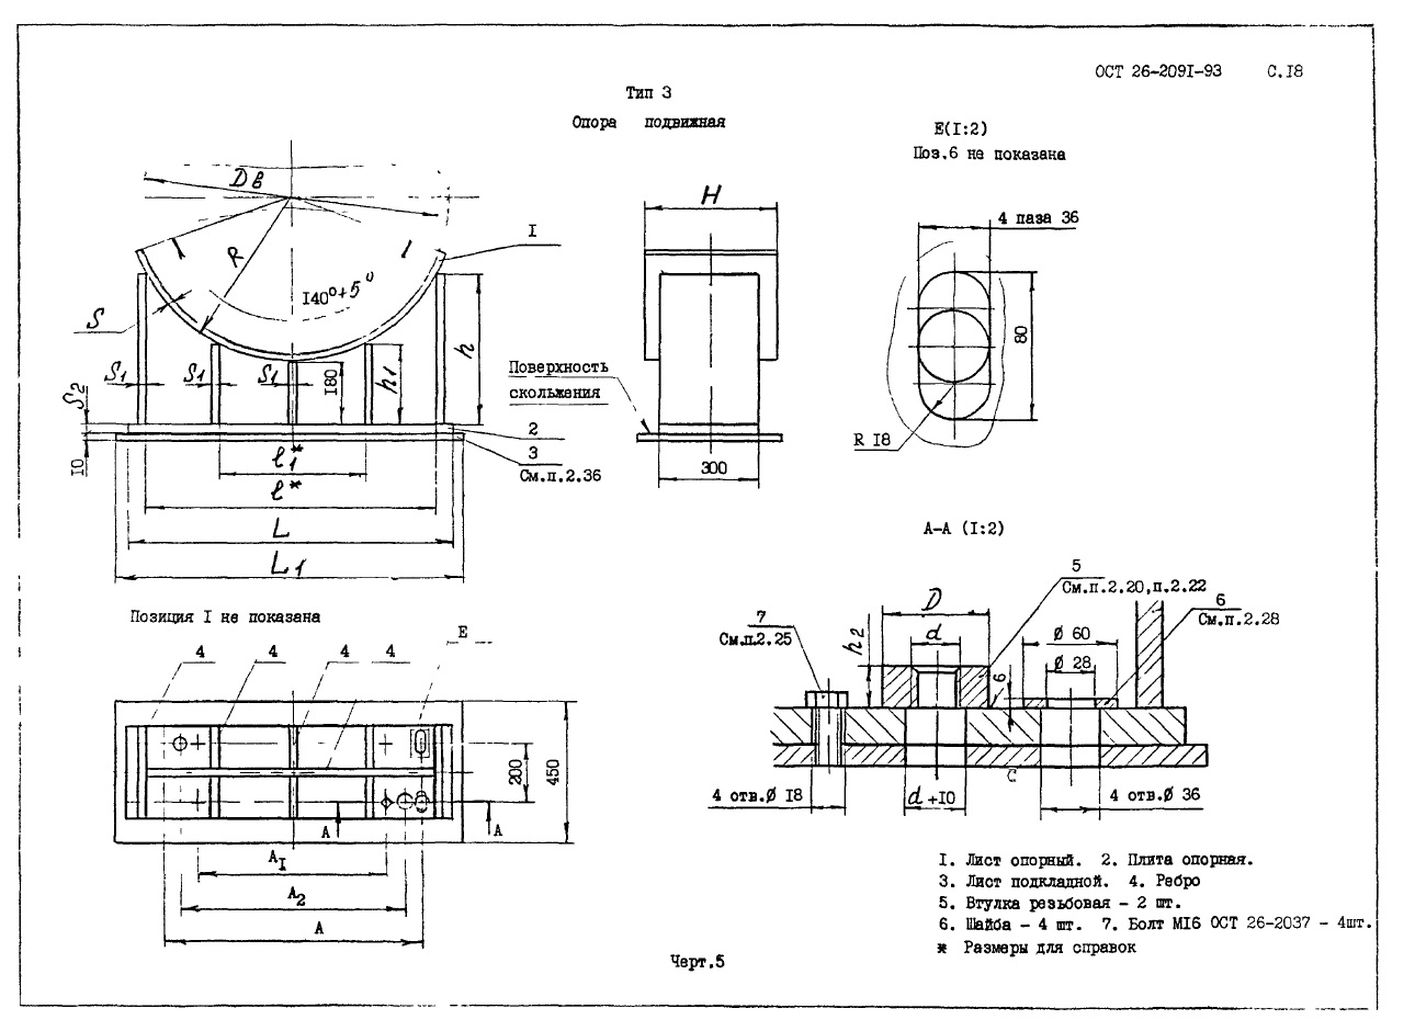 Опоры тип 3 ОСТ 26-2091-93 стр.1